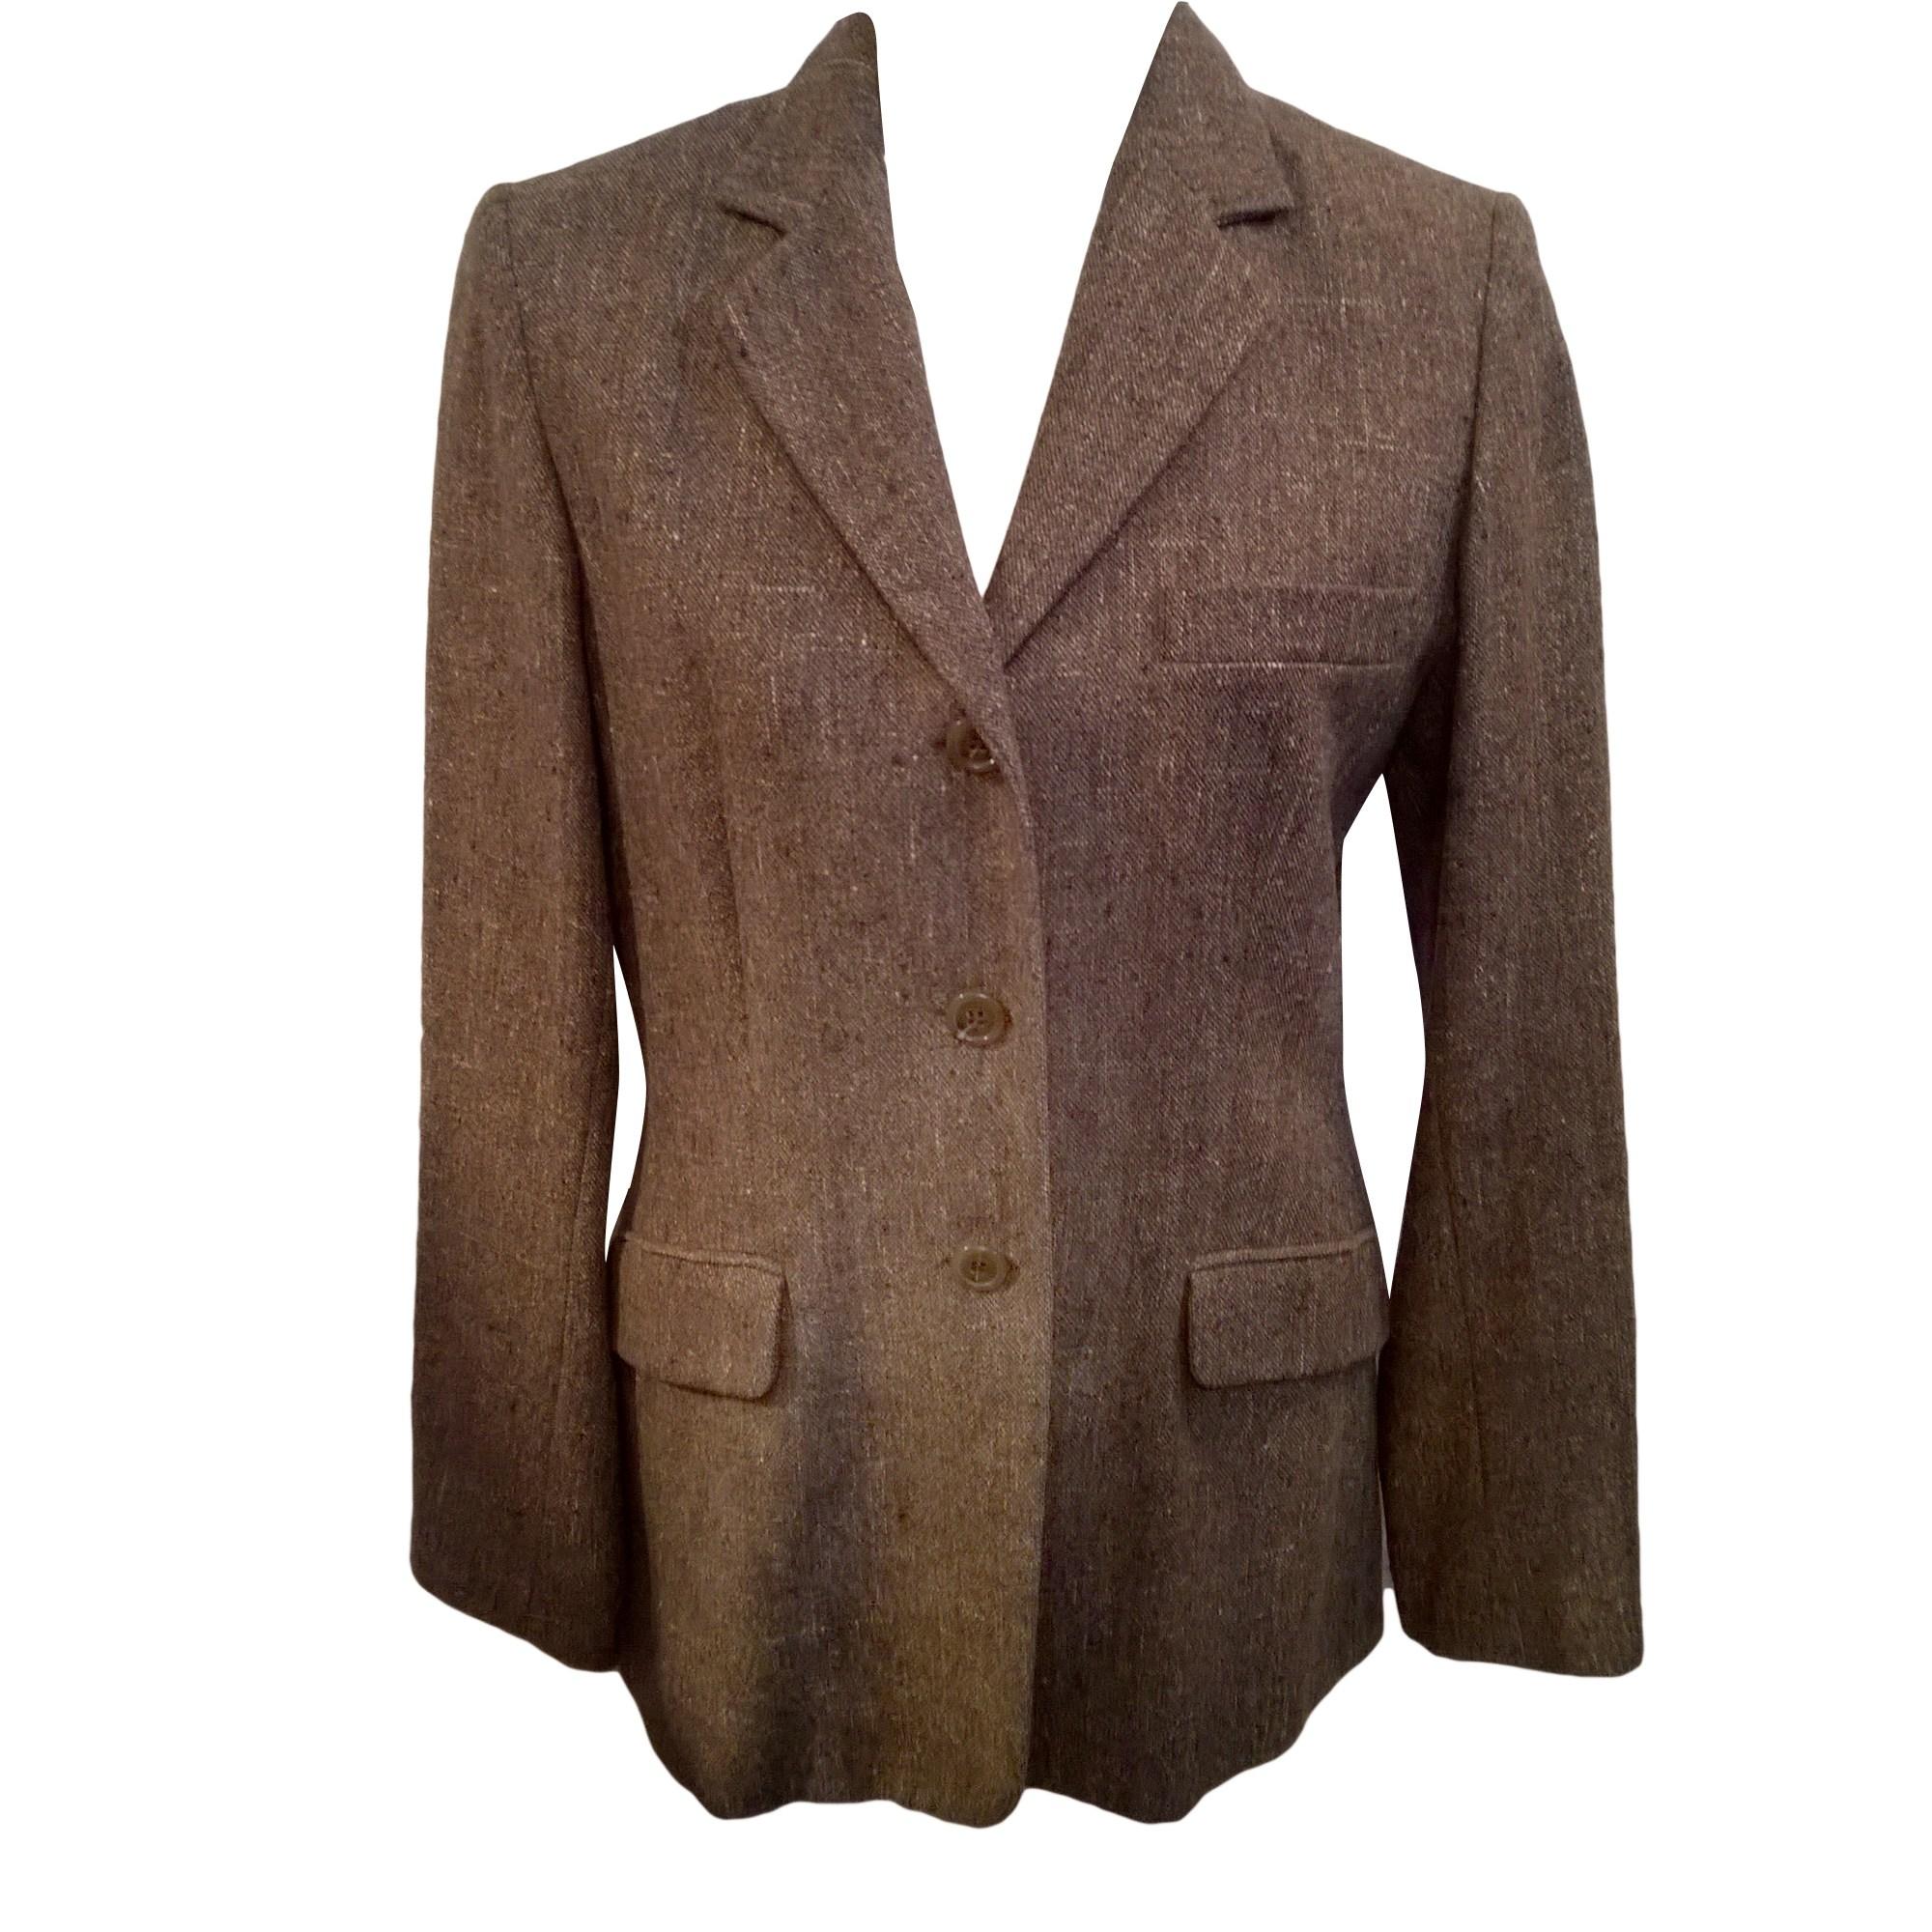 Blazer, veste tailleur GERARD DAREL Chiné brun et beige